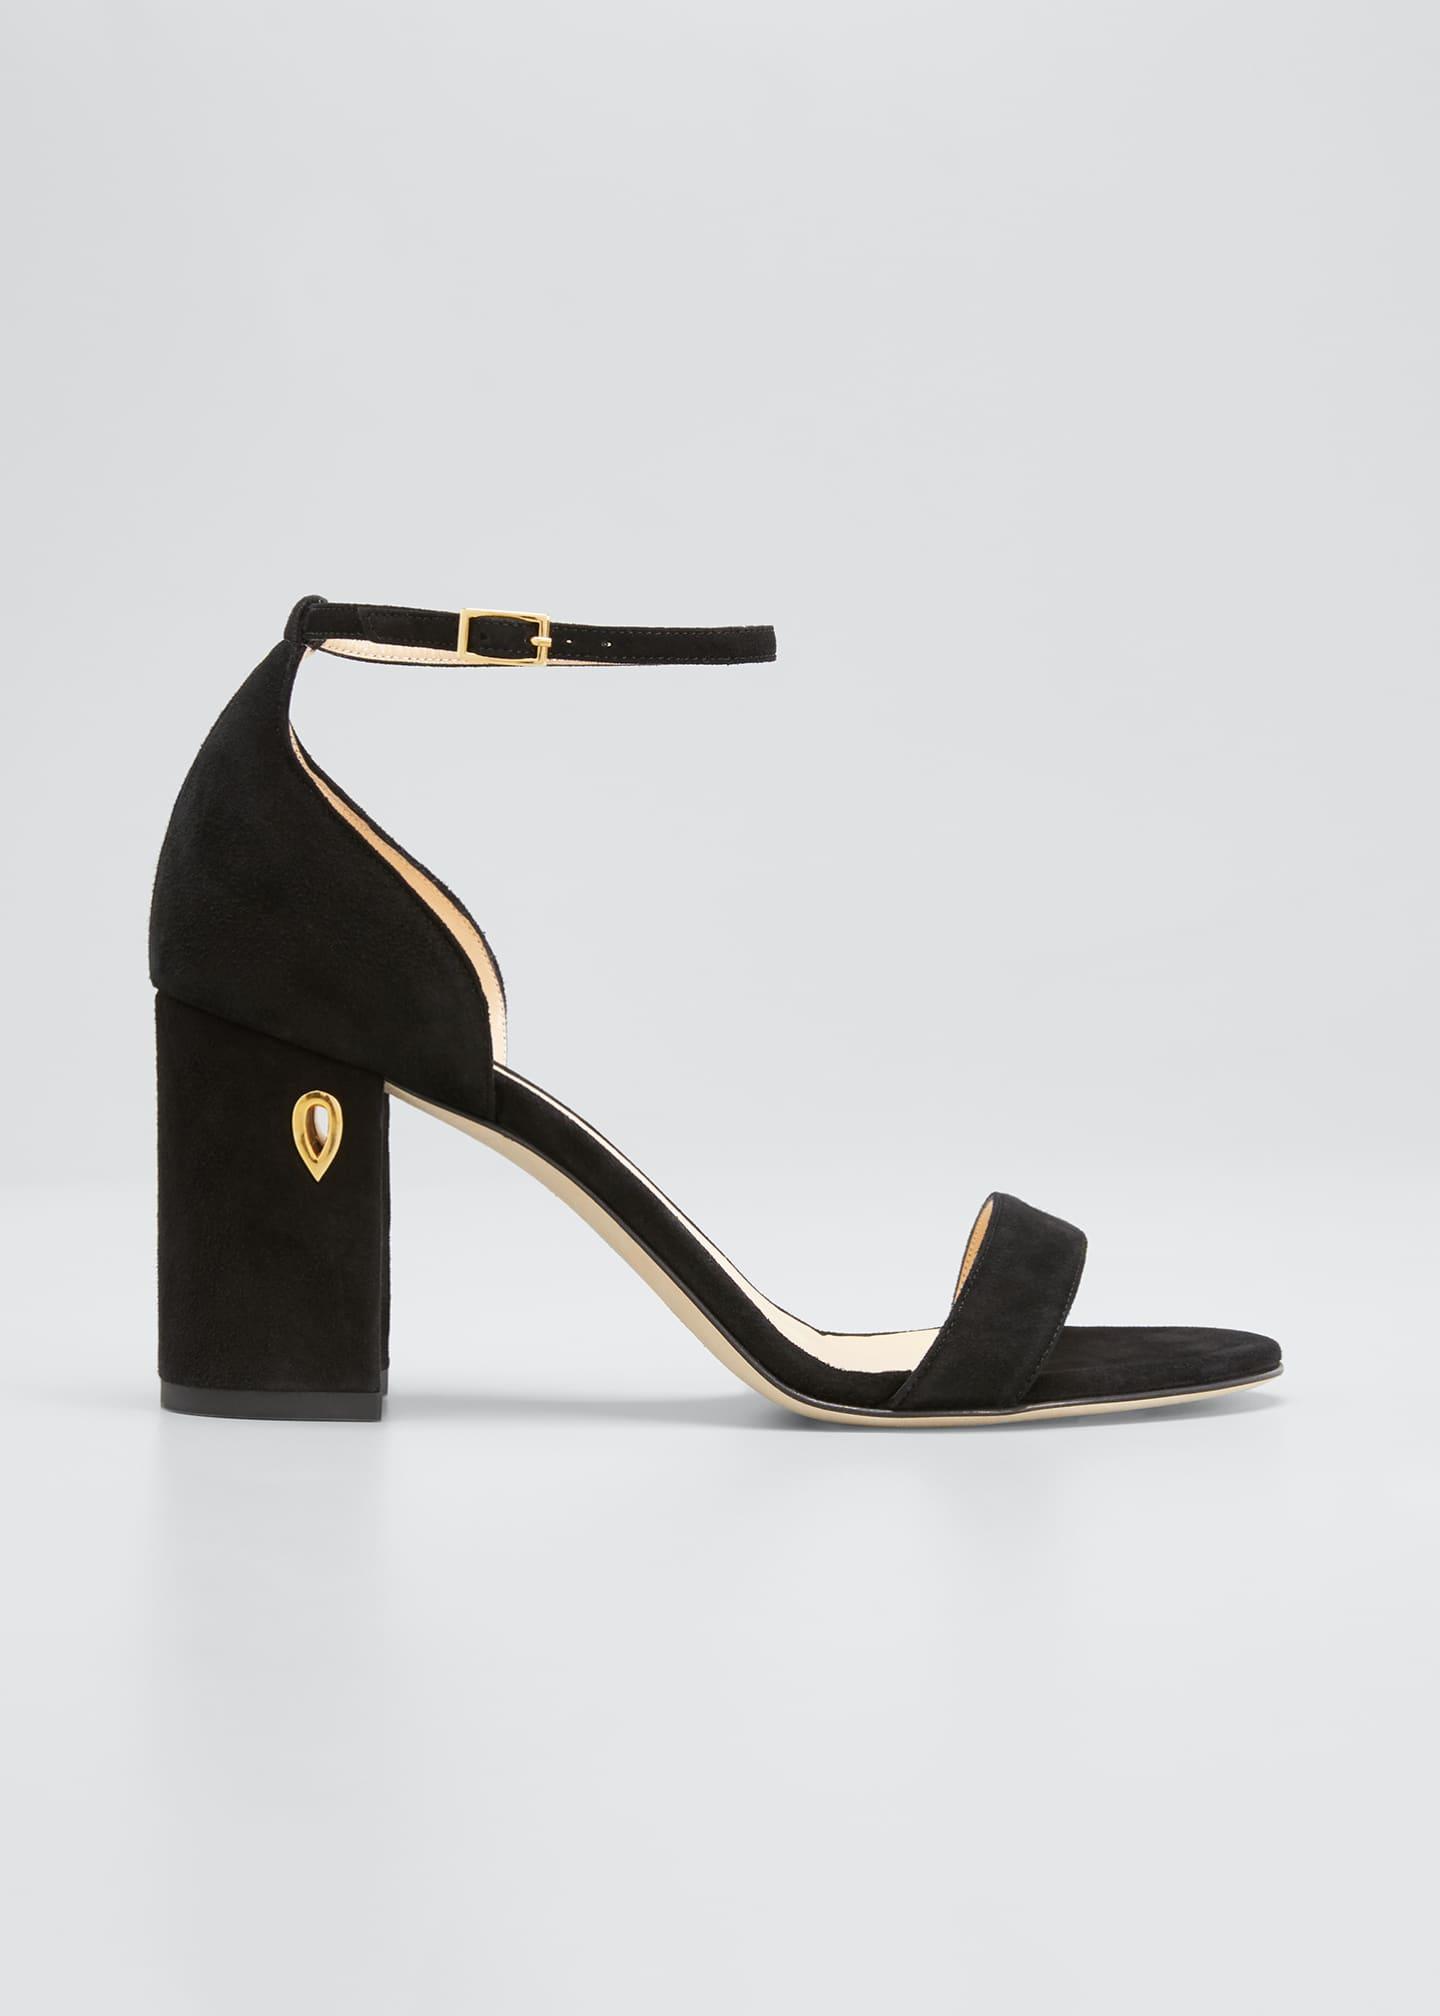 Jennifer Chamandi 85mm Suede Block-Heel Sandals